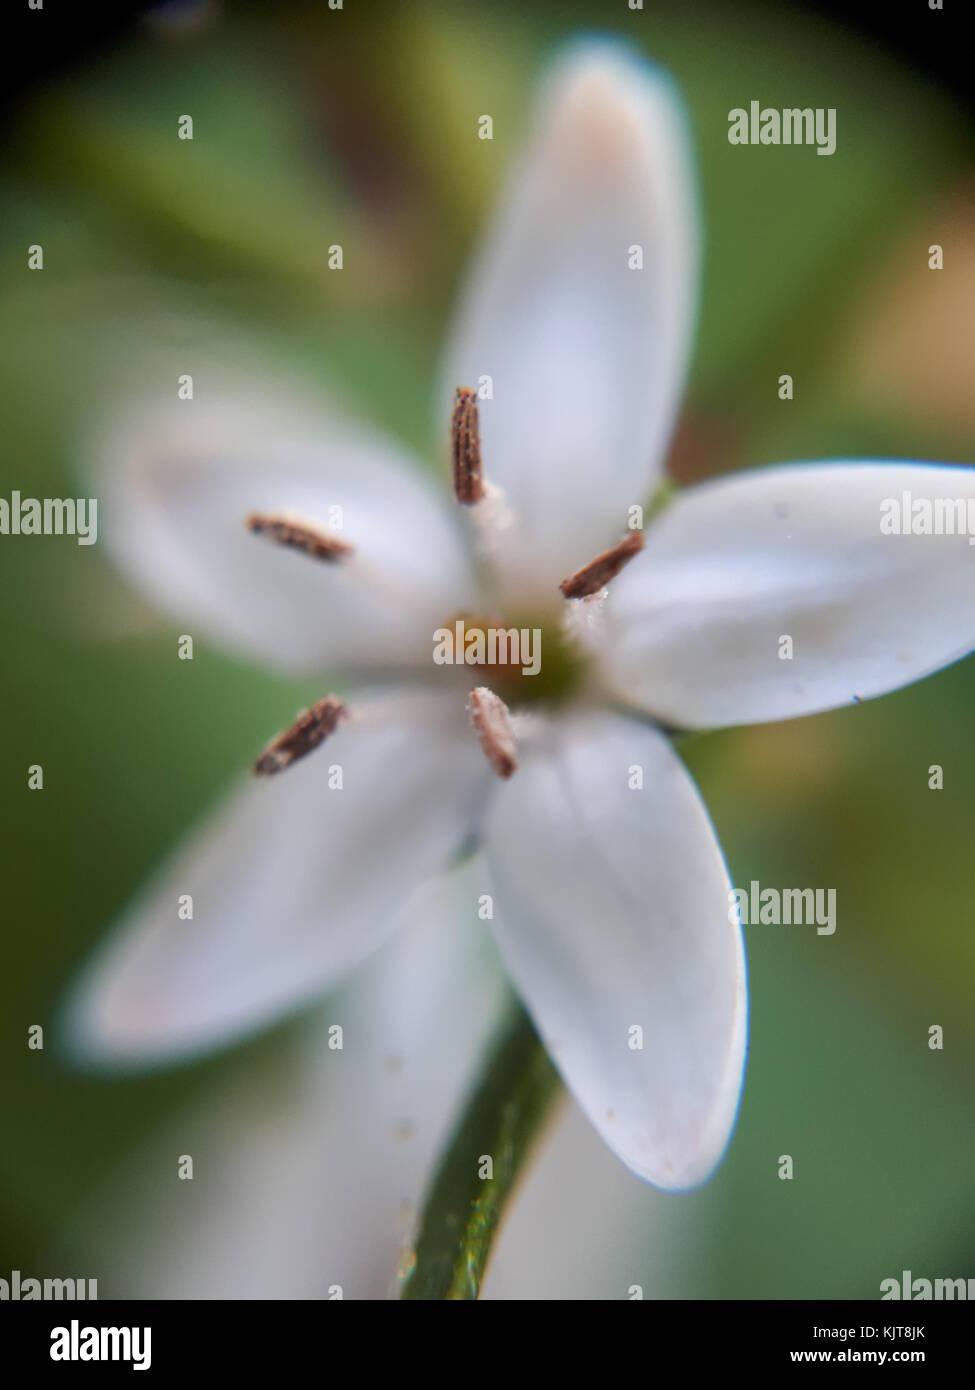 Flower with five petals stock photos flower with five petals stock pretty white flower close up macro with five petals in a devon garden stock image mightylinksfo